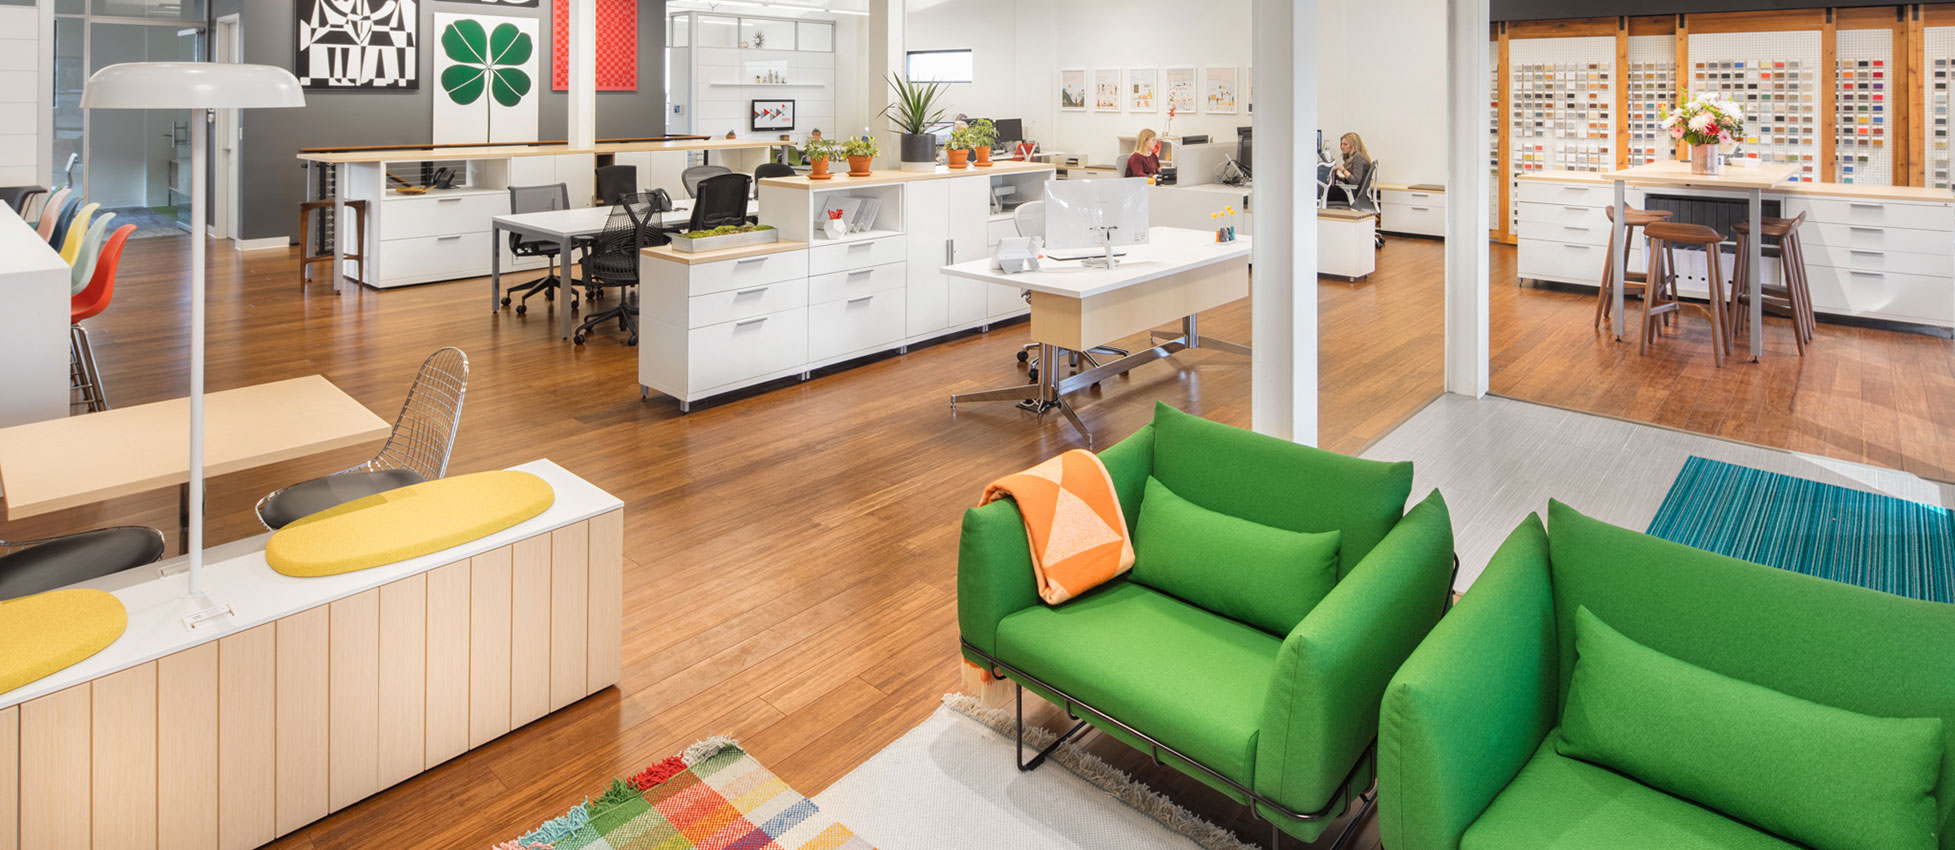 Pigott business space